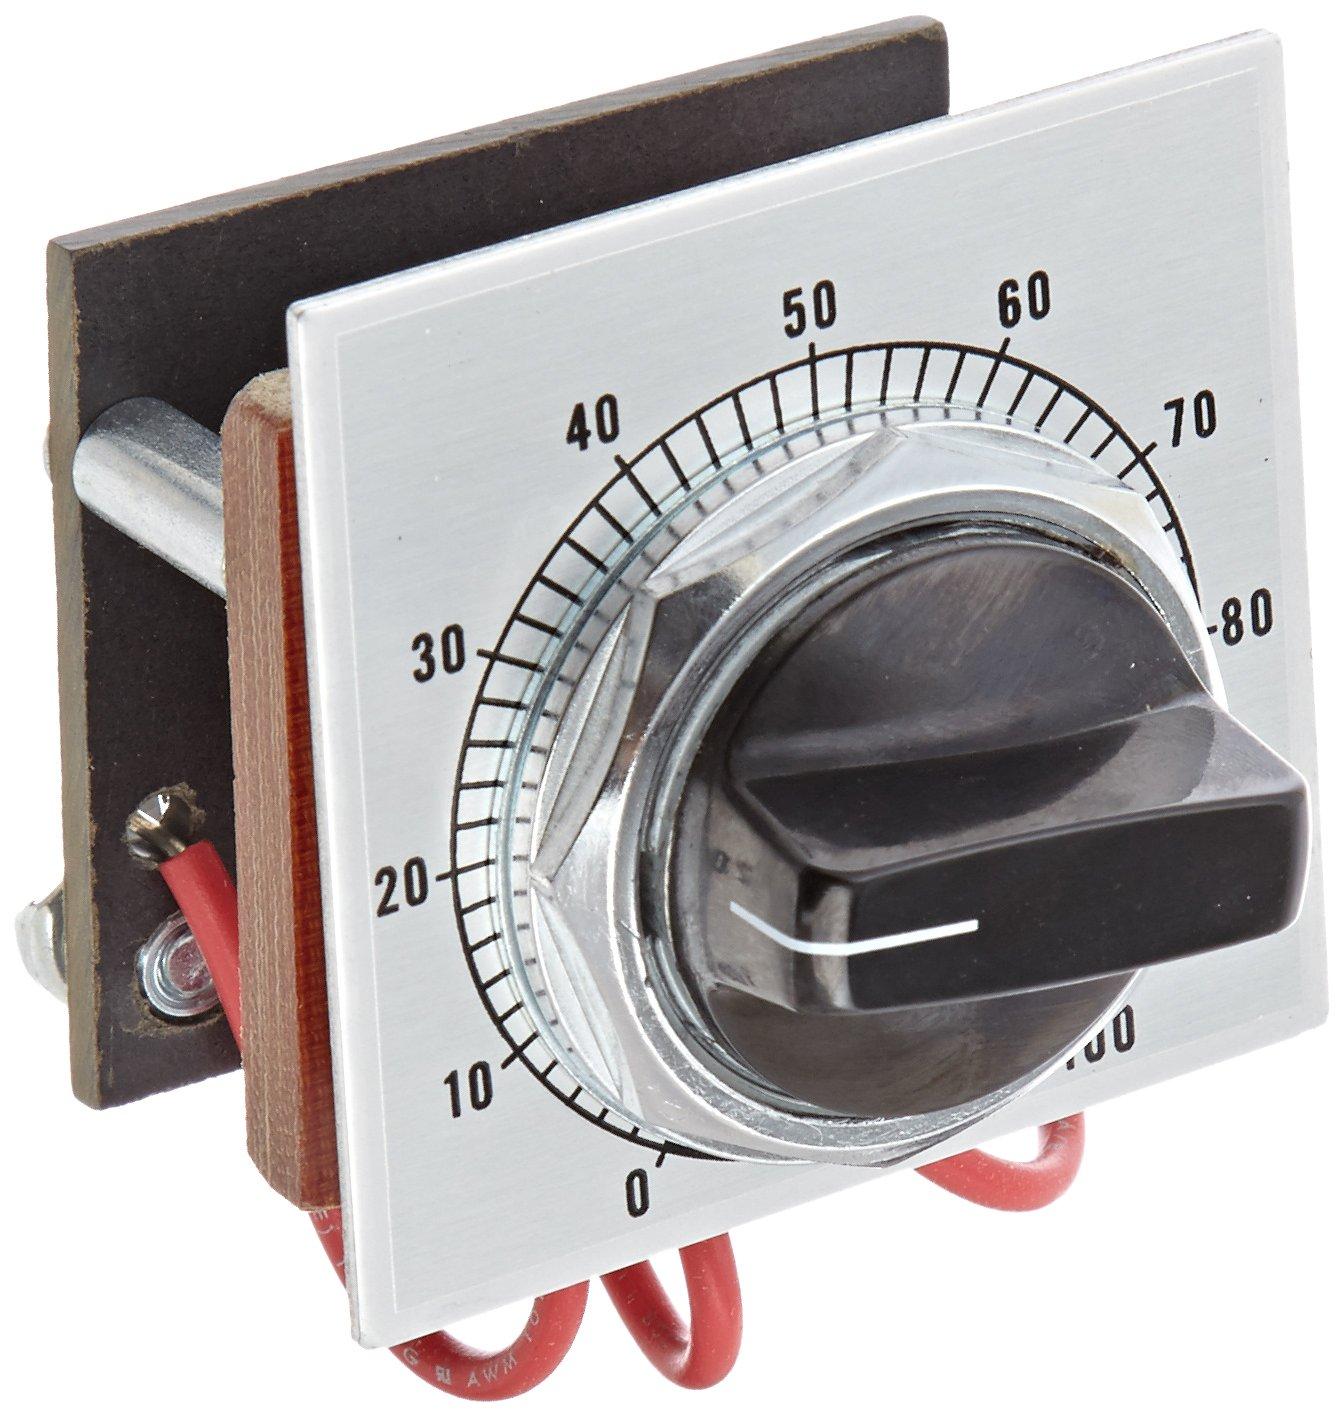 Siemens 52MA3B14 Heavy Duty Potentiometer Operator, 2 Watts, 500VAC/VDC, Type 12/3 Only, 10 kiloohms by SIEMENS